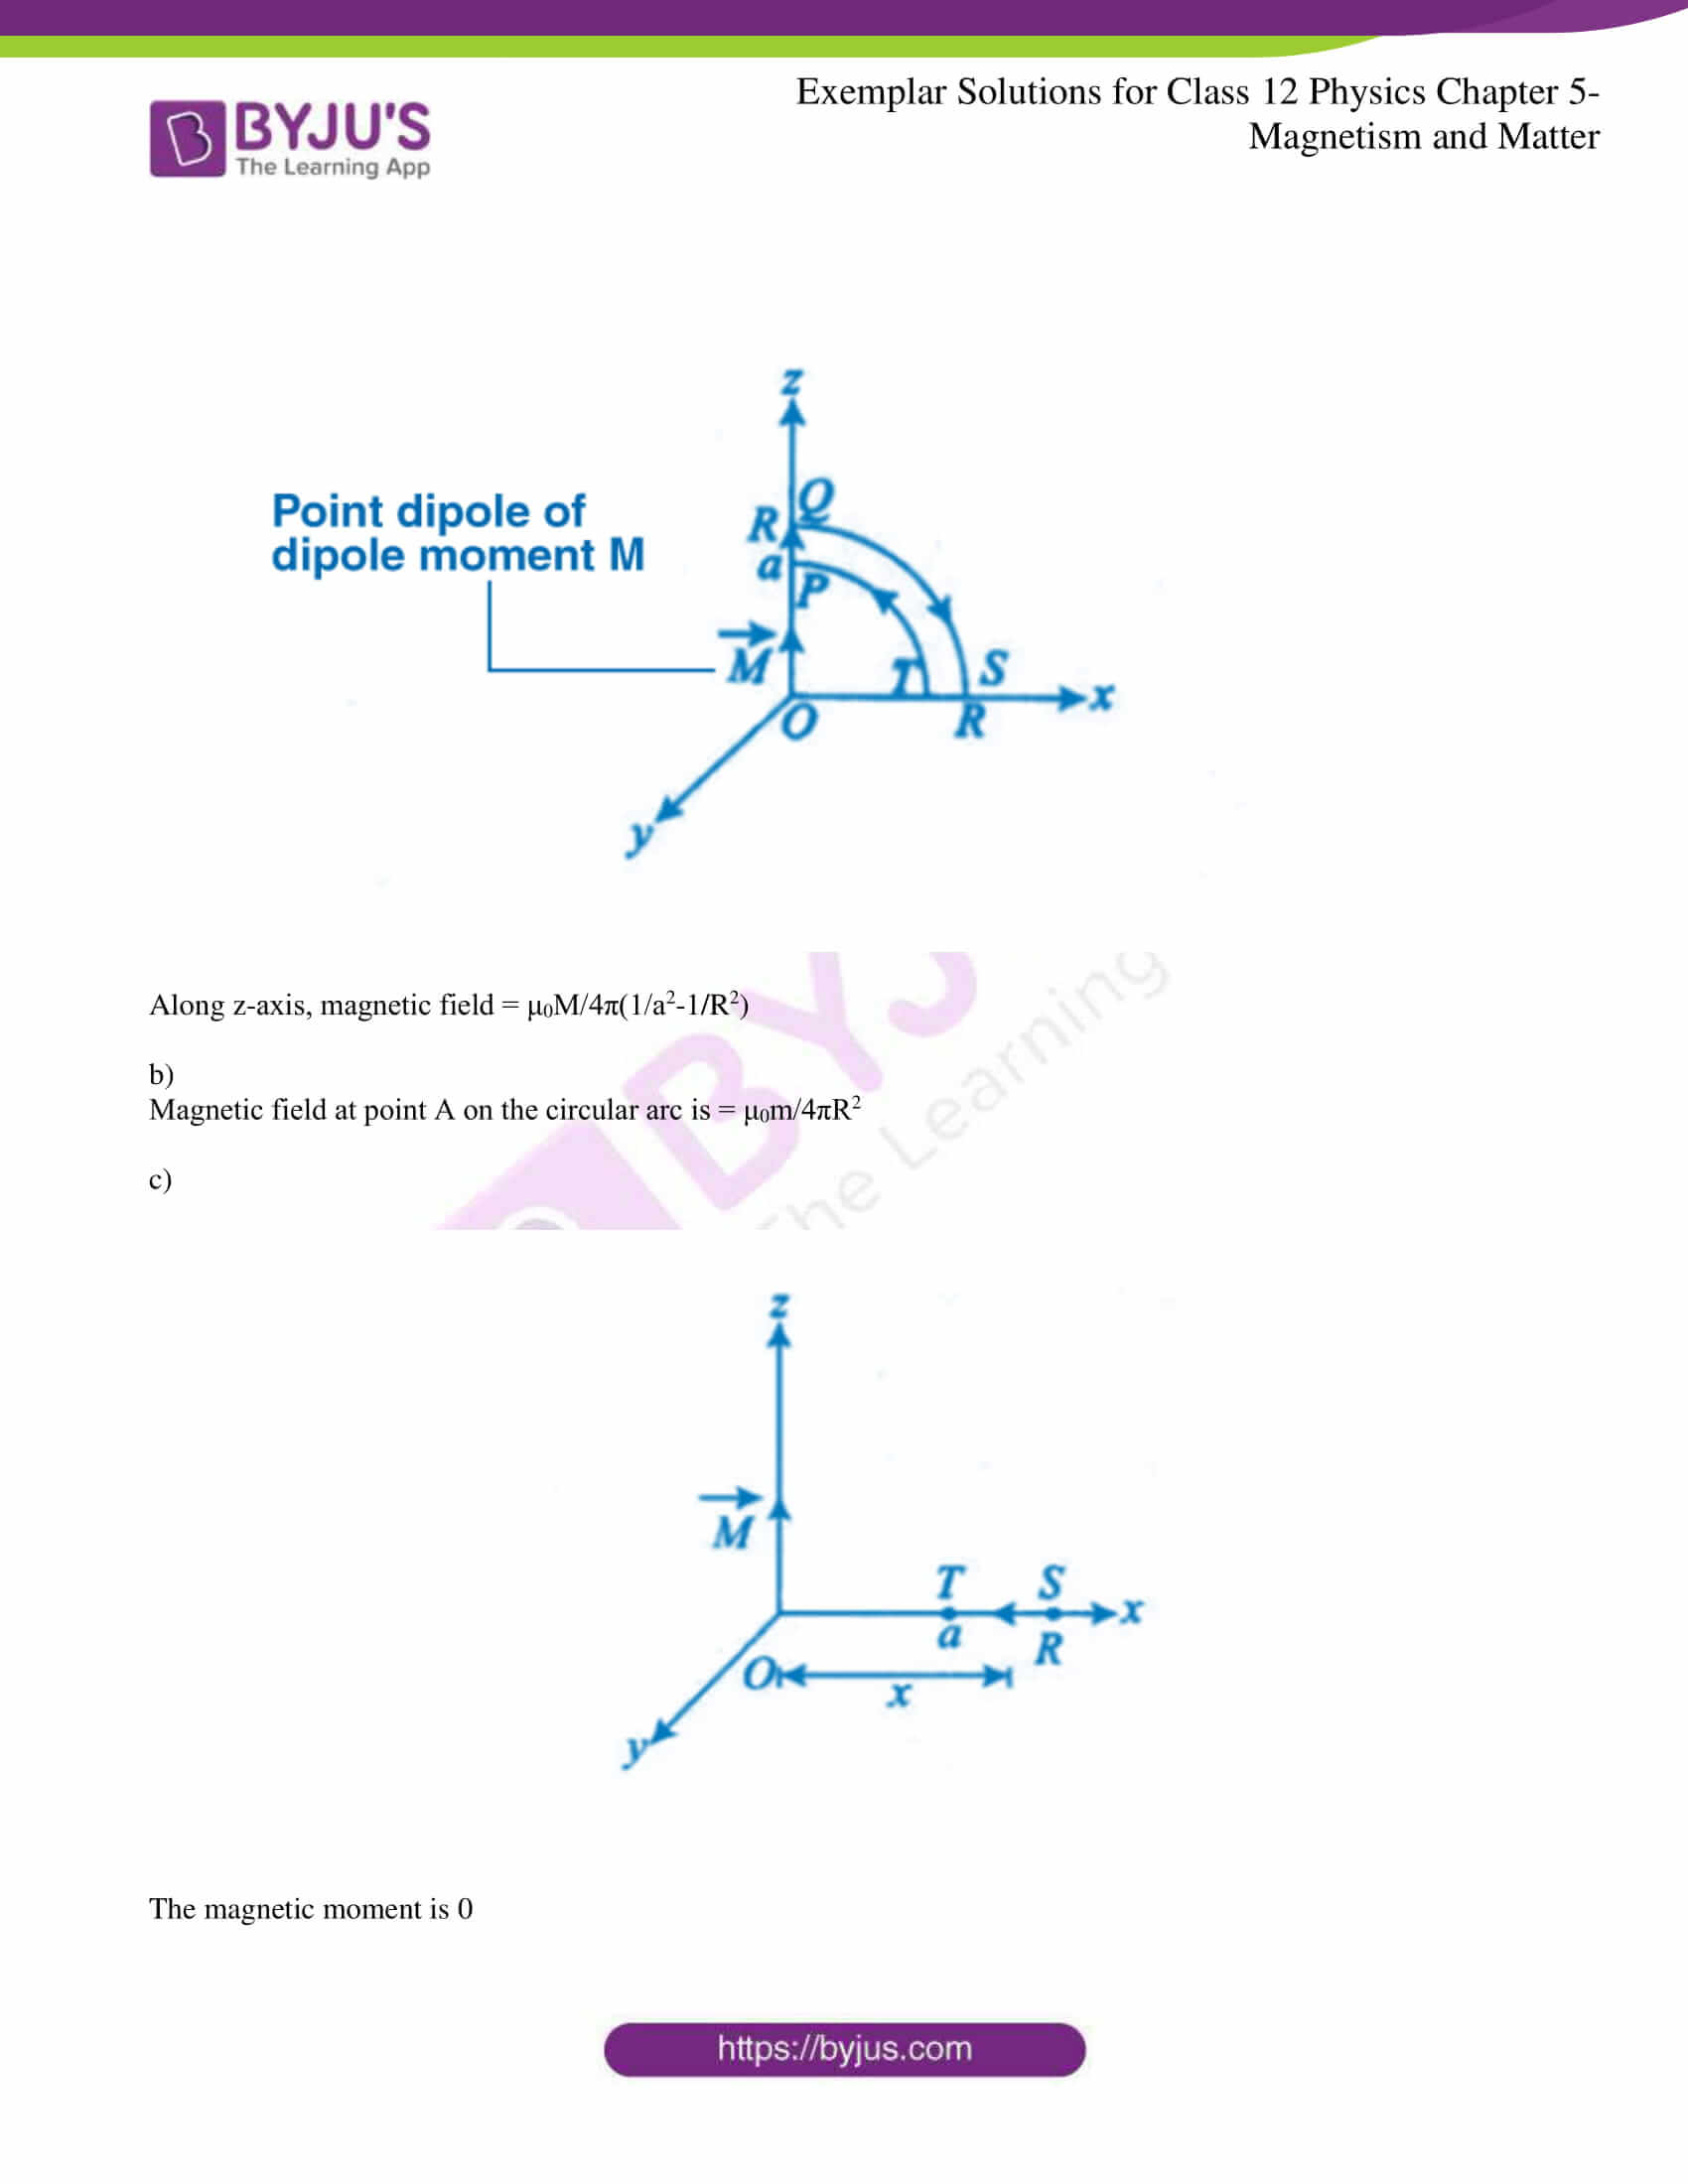 ncert exemplar solutions for class 12 physics chapter 5 08